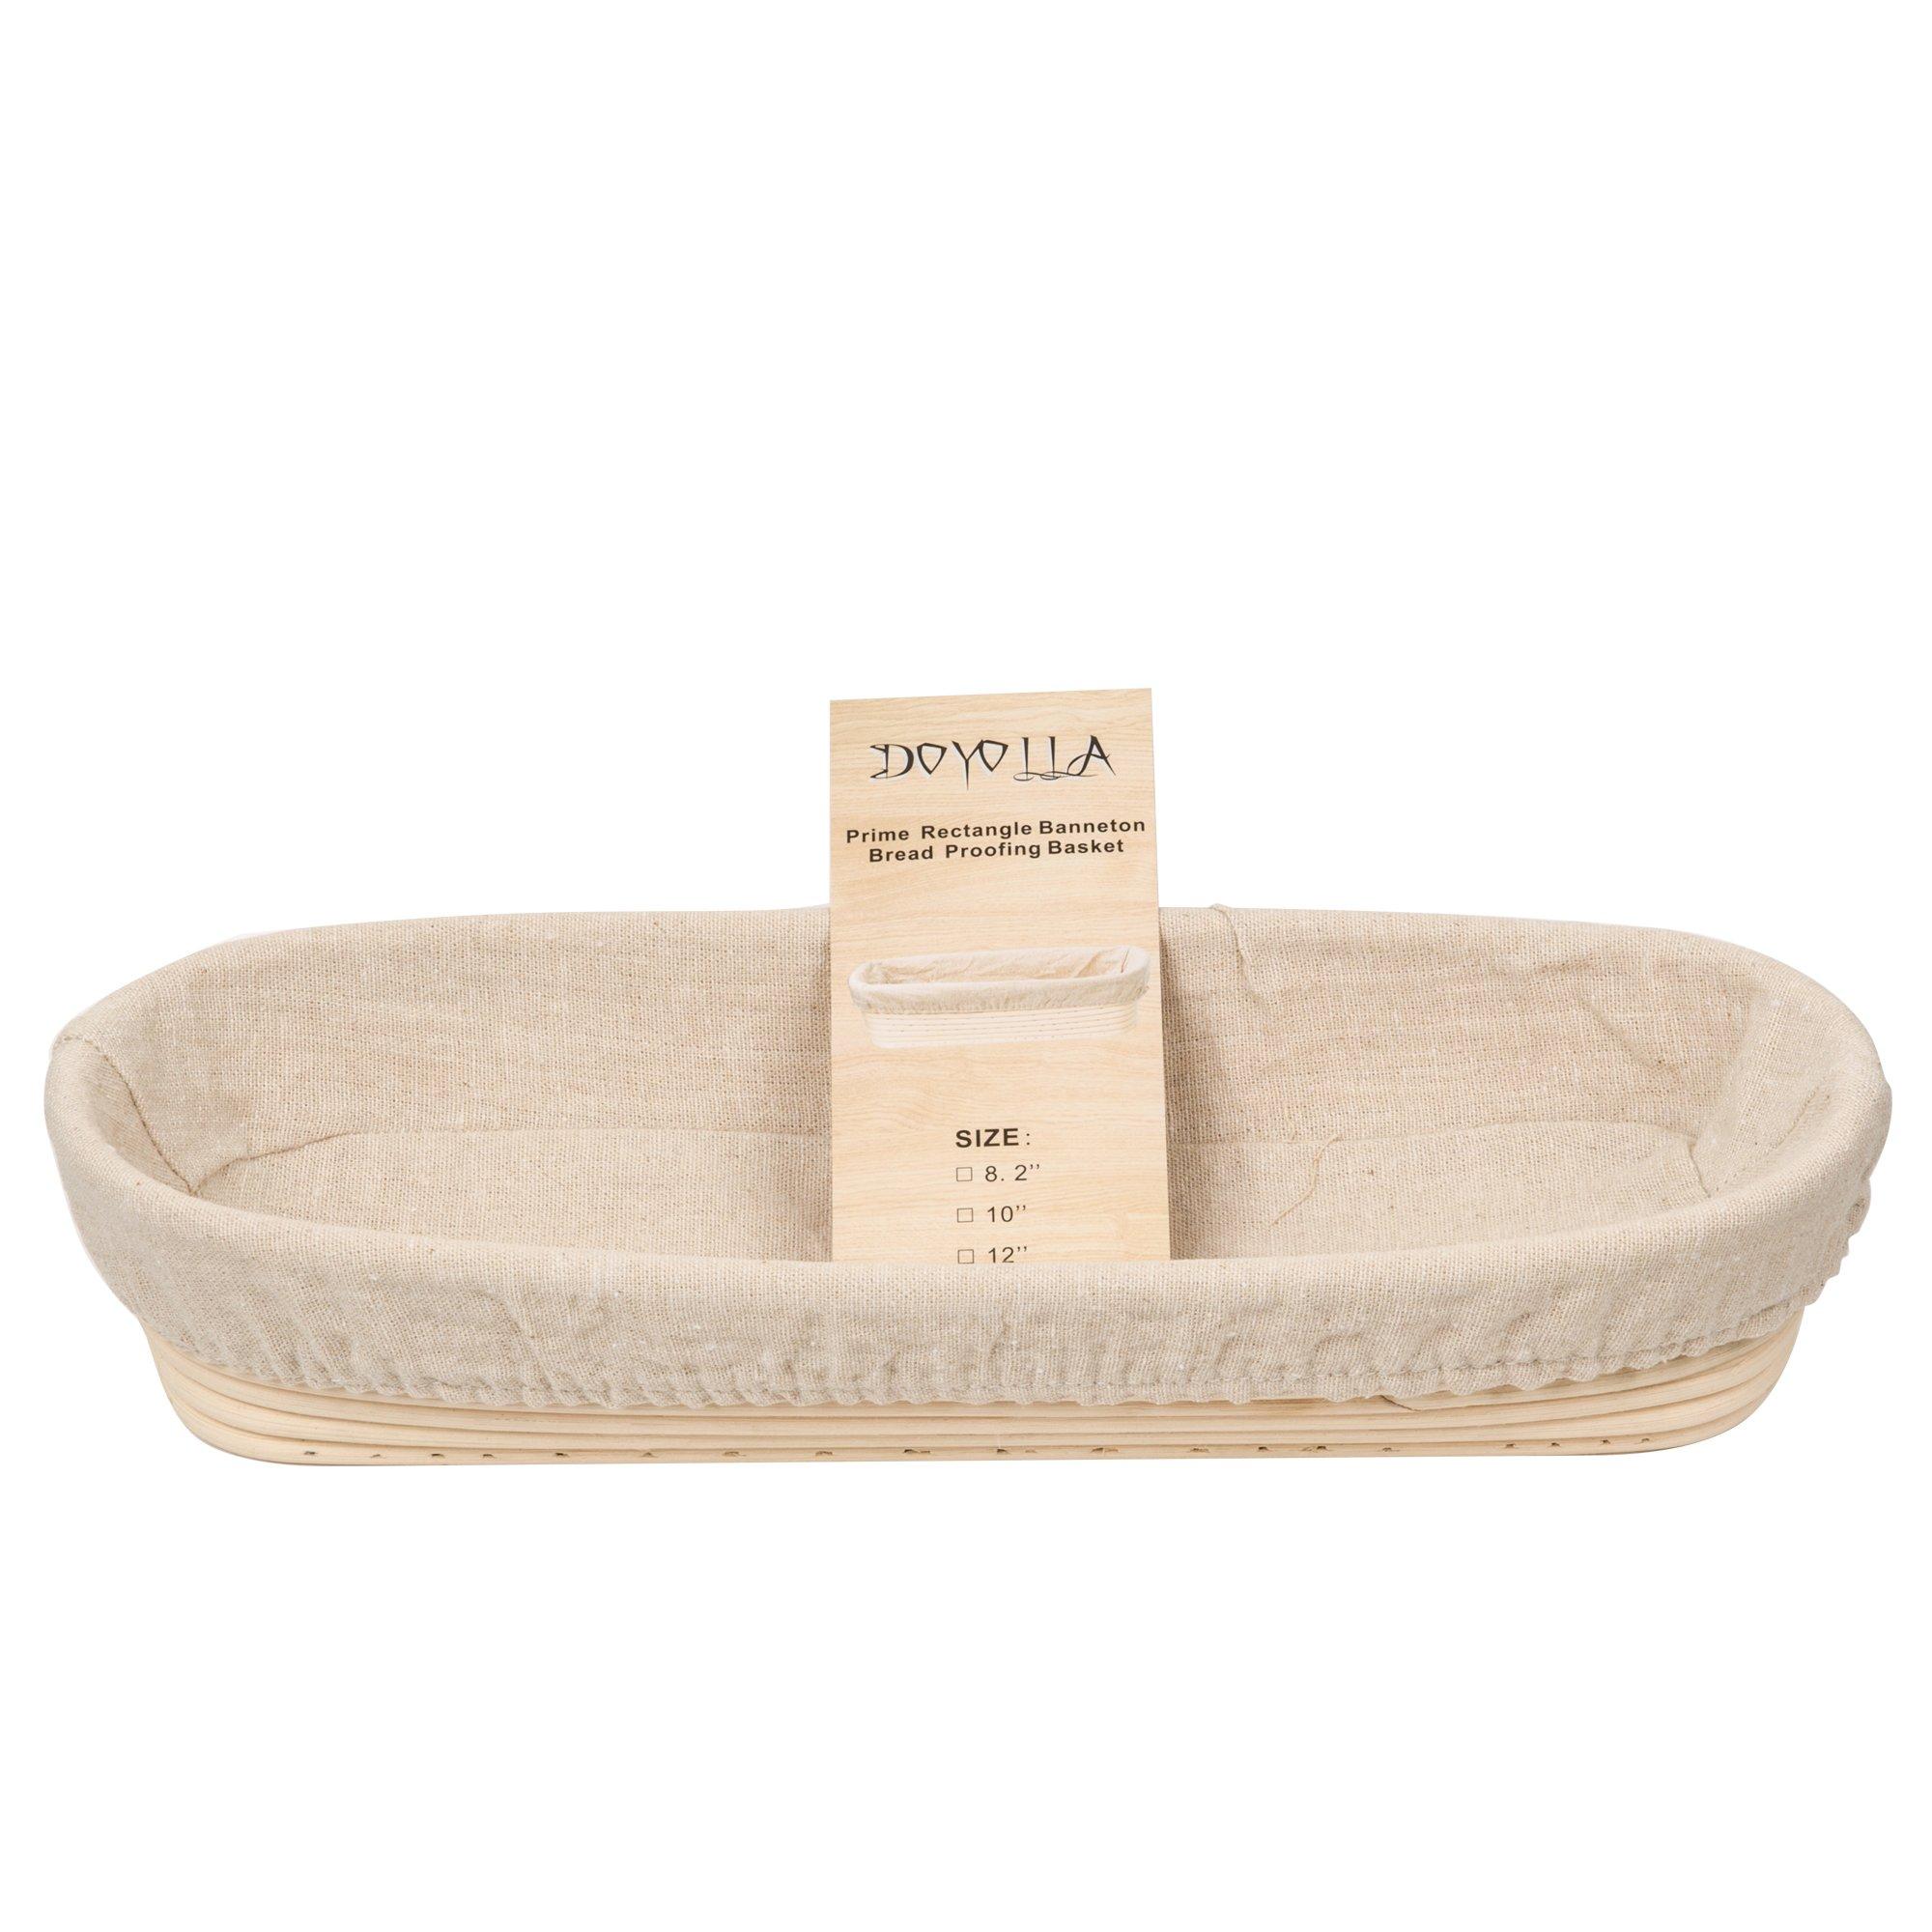 DOYOLLA 1pcs 14.7'' Oval Long Banneton Brotform Bread Dough Proofing Rising Rattan Basket & Liner…